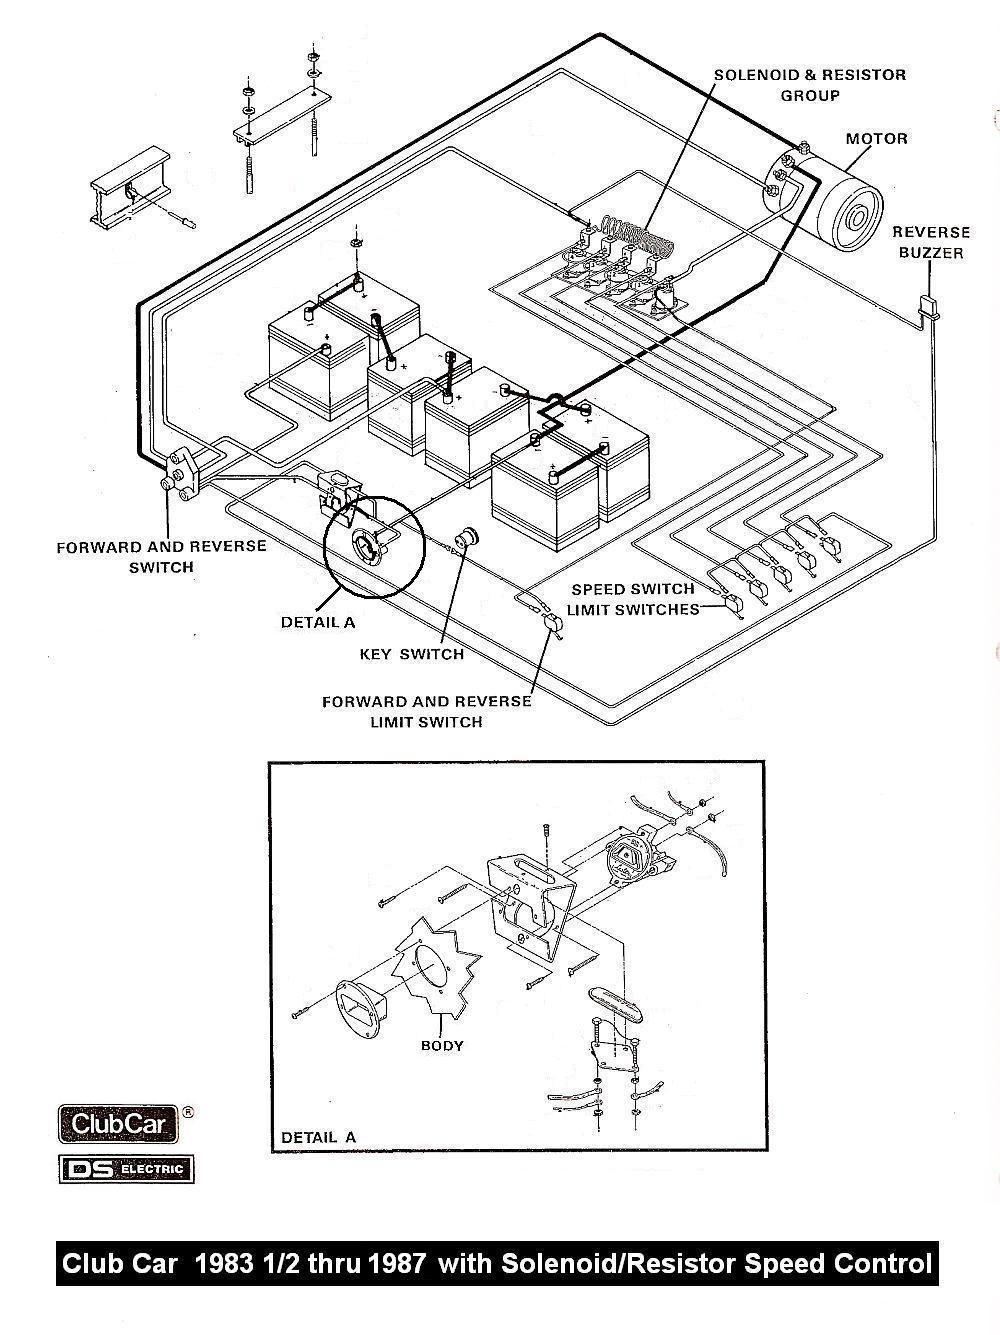 ez go golf cart 36 volt wiring diagrams 2001 nissan xterra engine diagram vintagegolfcartparts.com - | *freezer & crock pot* pinterest carts and cars